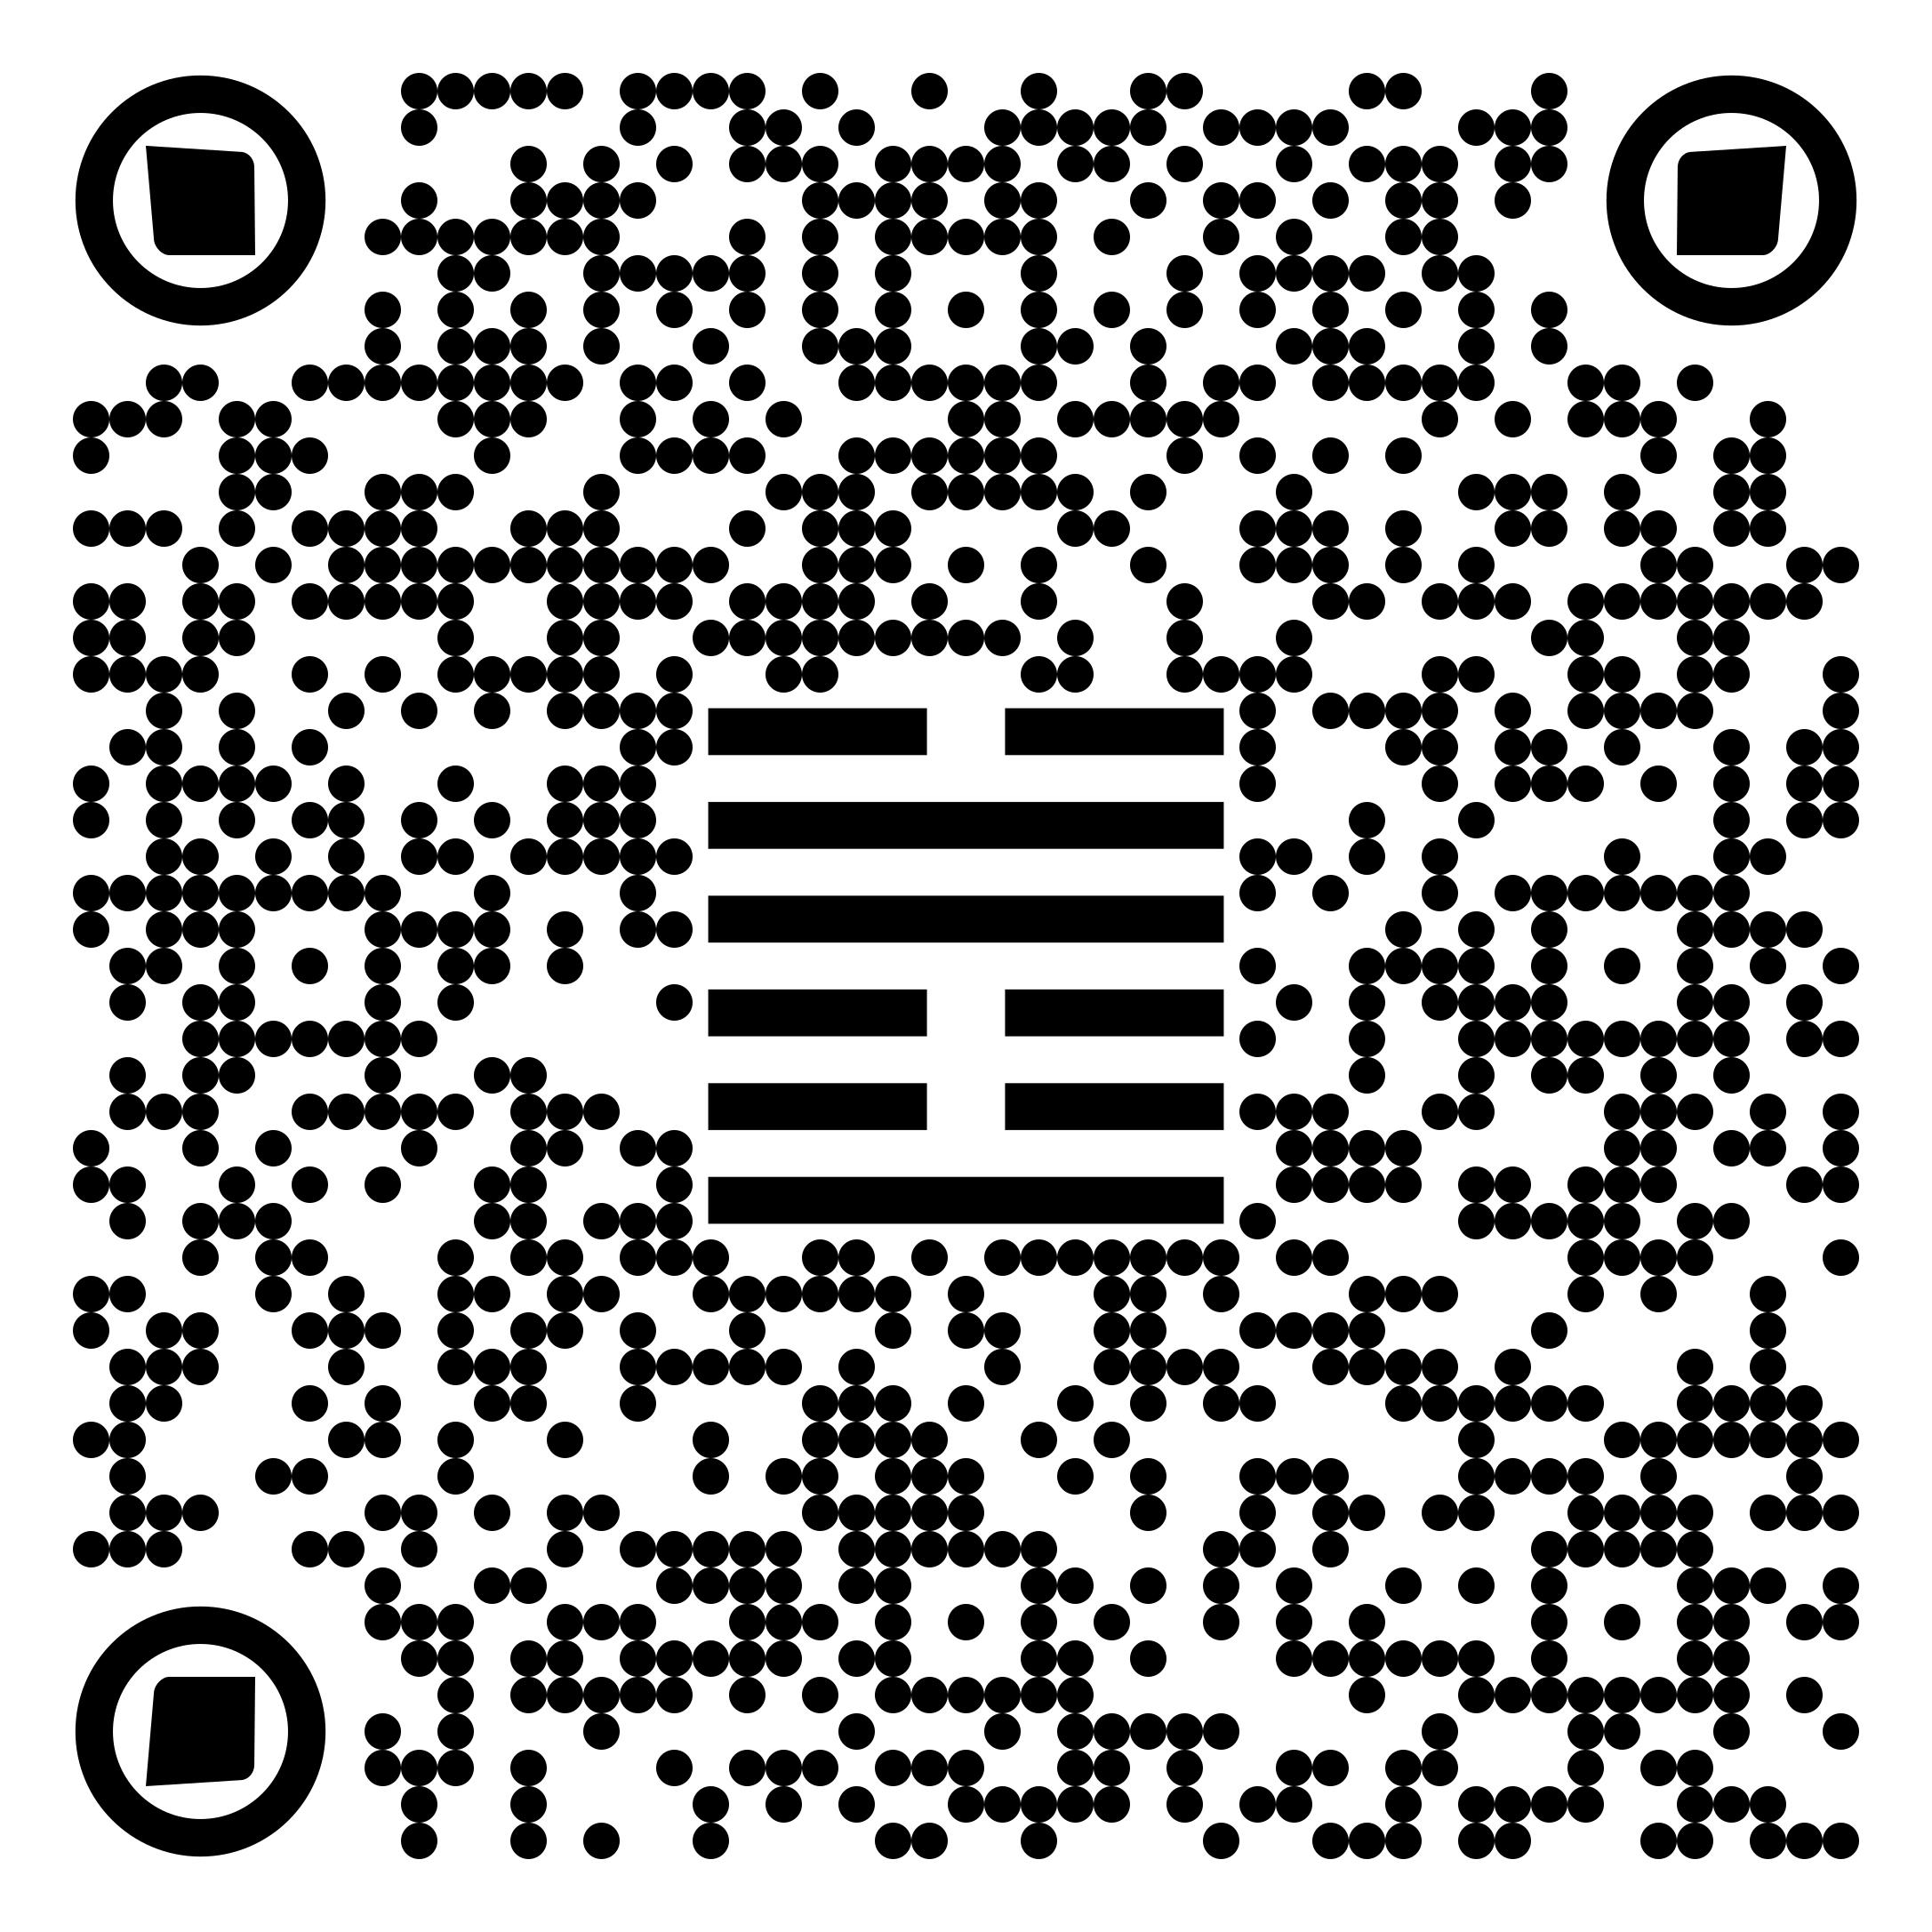 qr-code-17.png